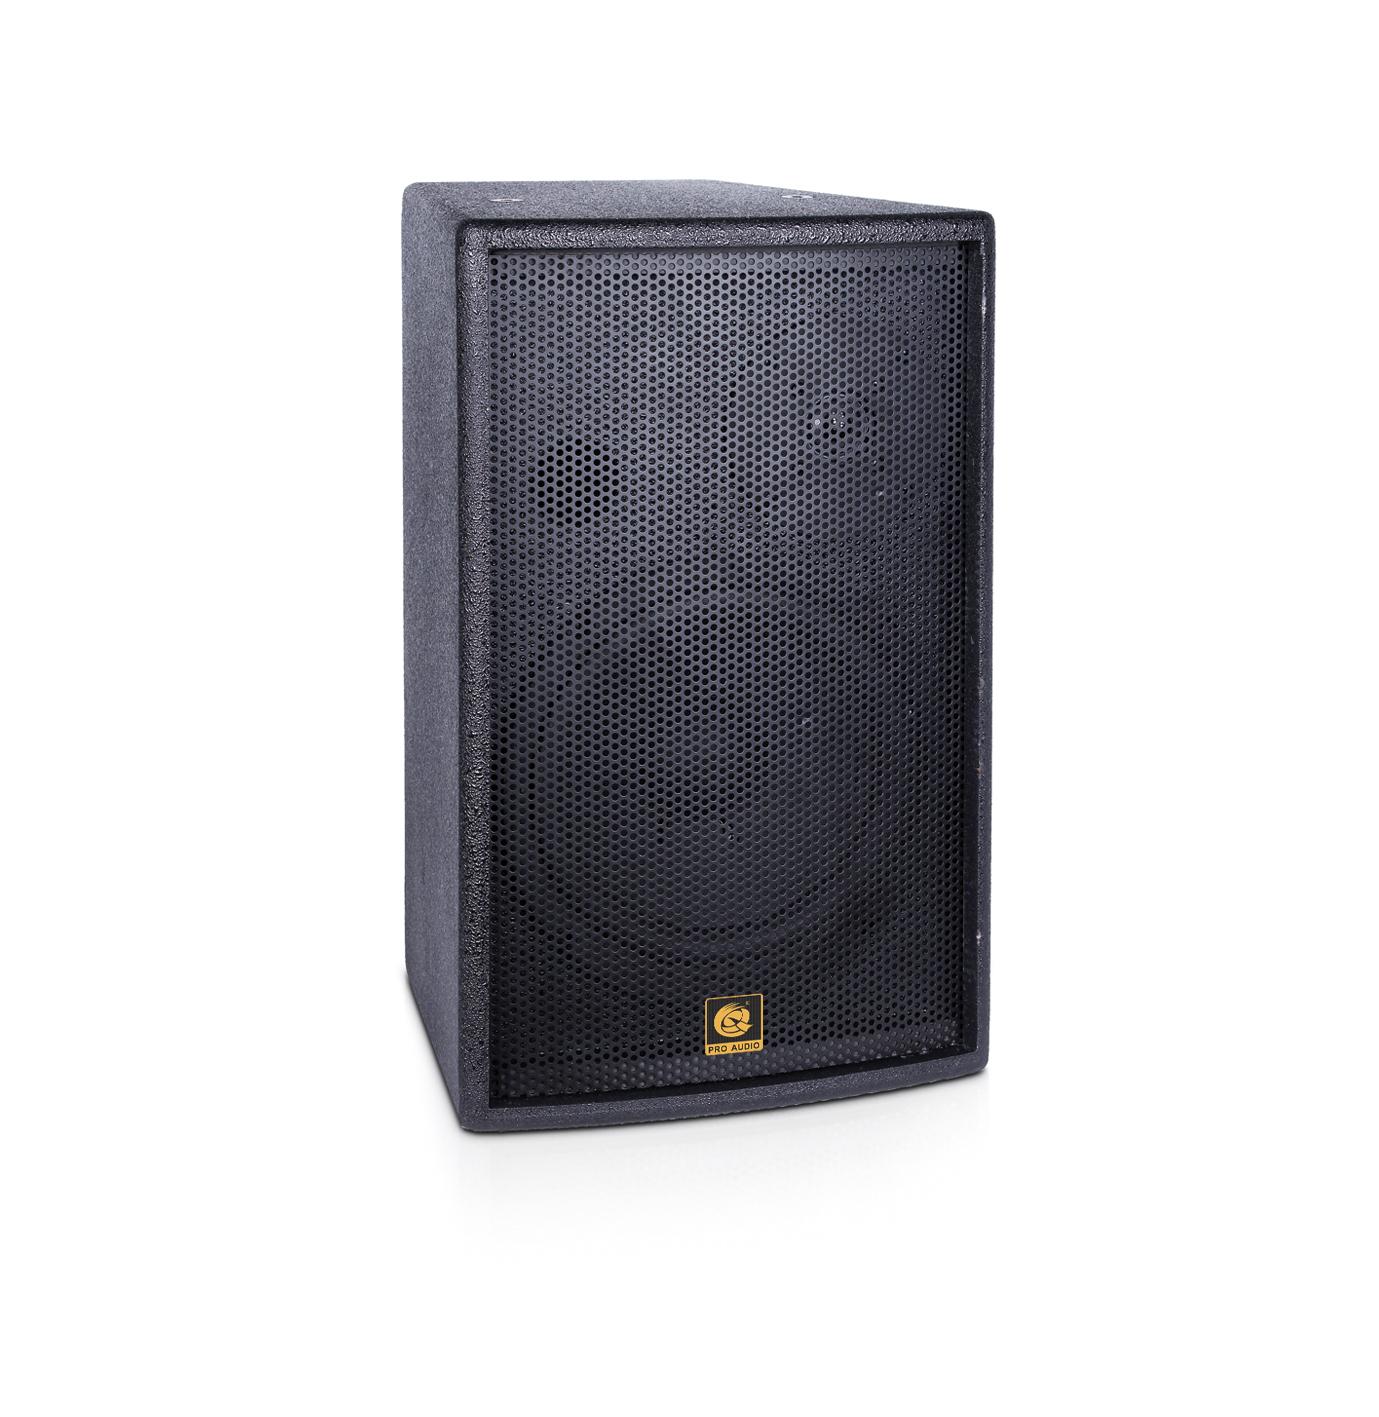 HY-208会议室音响8寸壁挂会议音箱培训教室背景音乐设备 HY208黑白可选